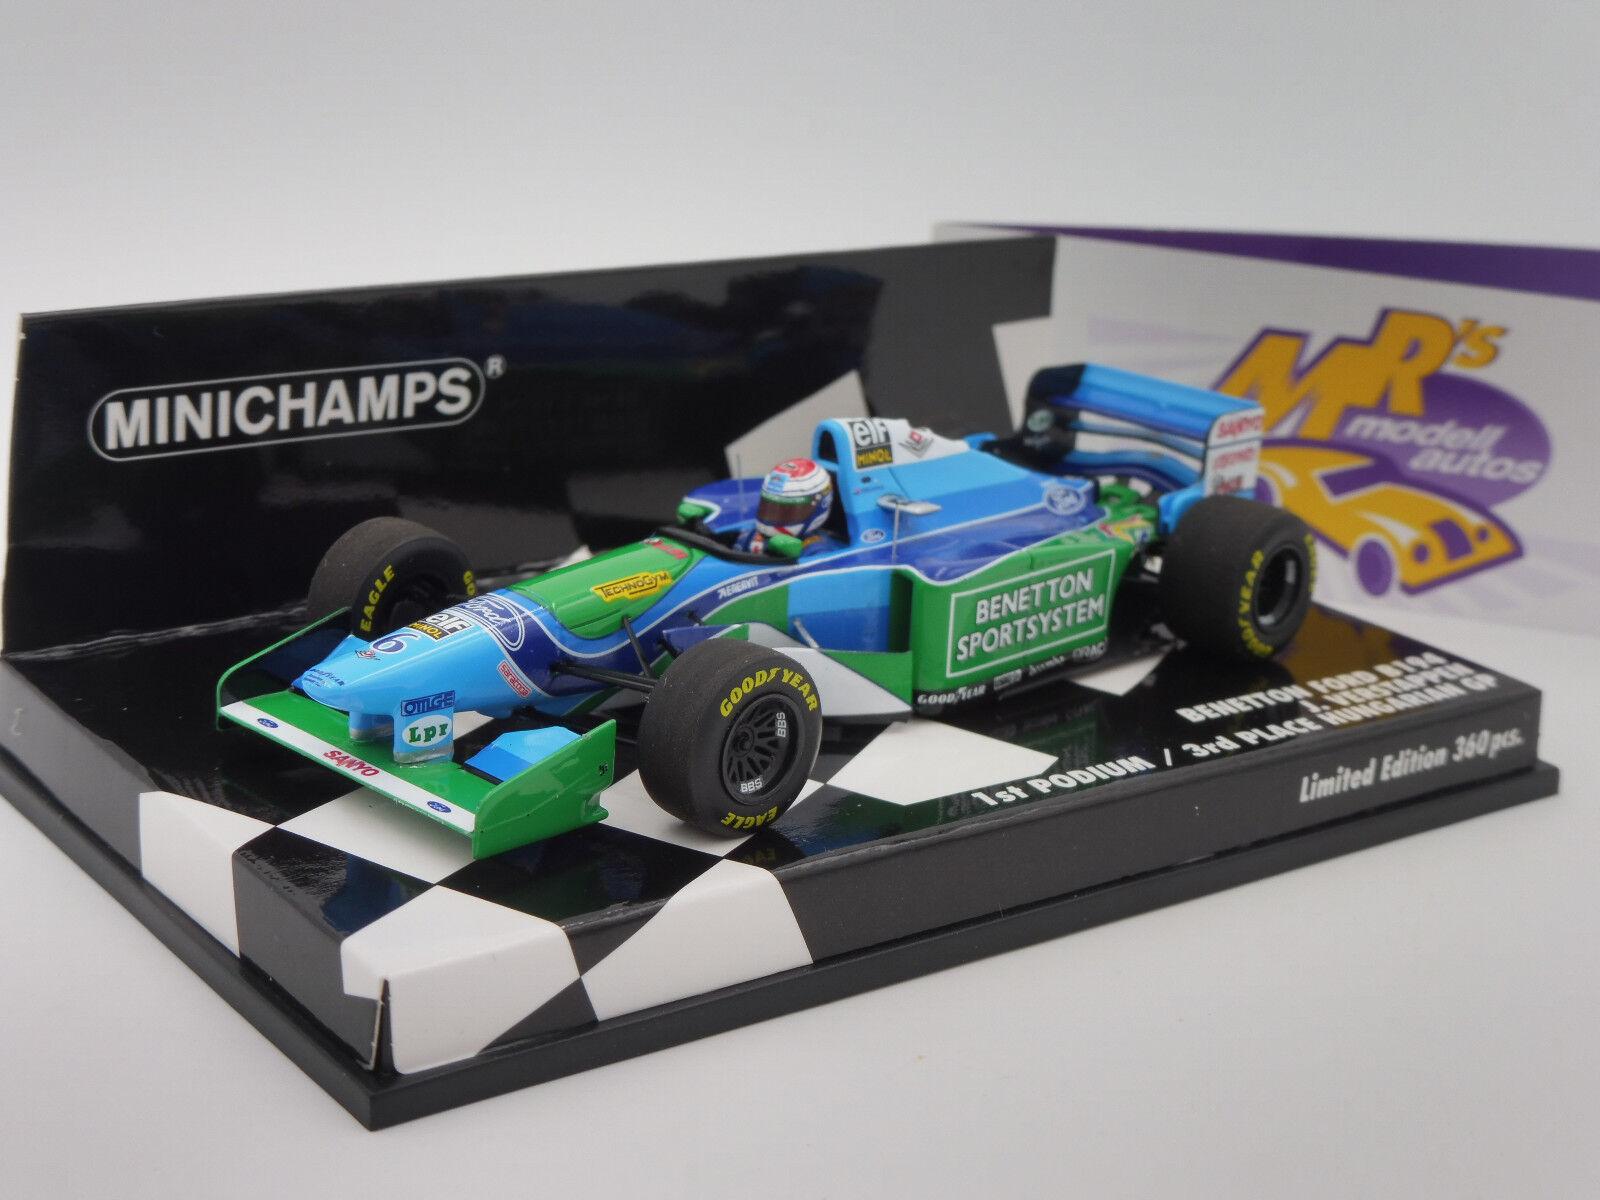 Minichamps 417941006   Benetton Benetton Ford B194 Ungarn GP 1994   J. Verstappen   1 43